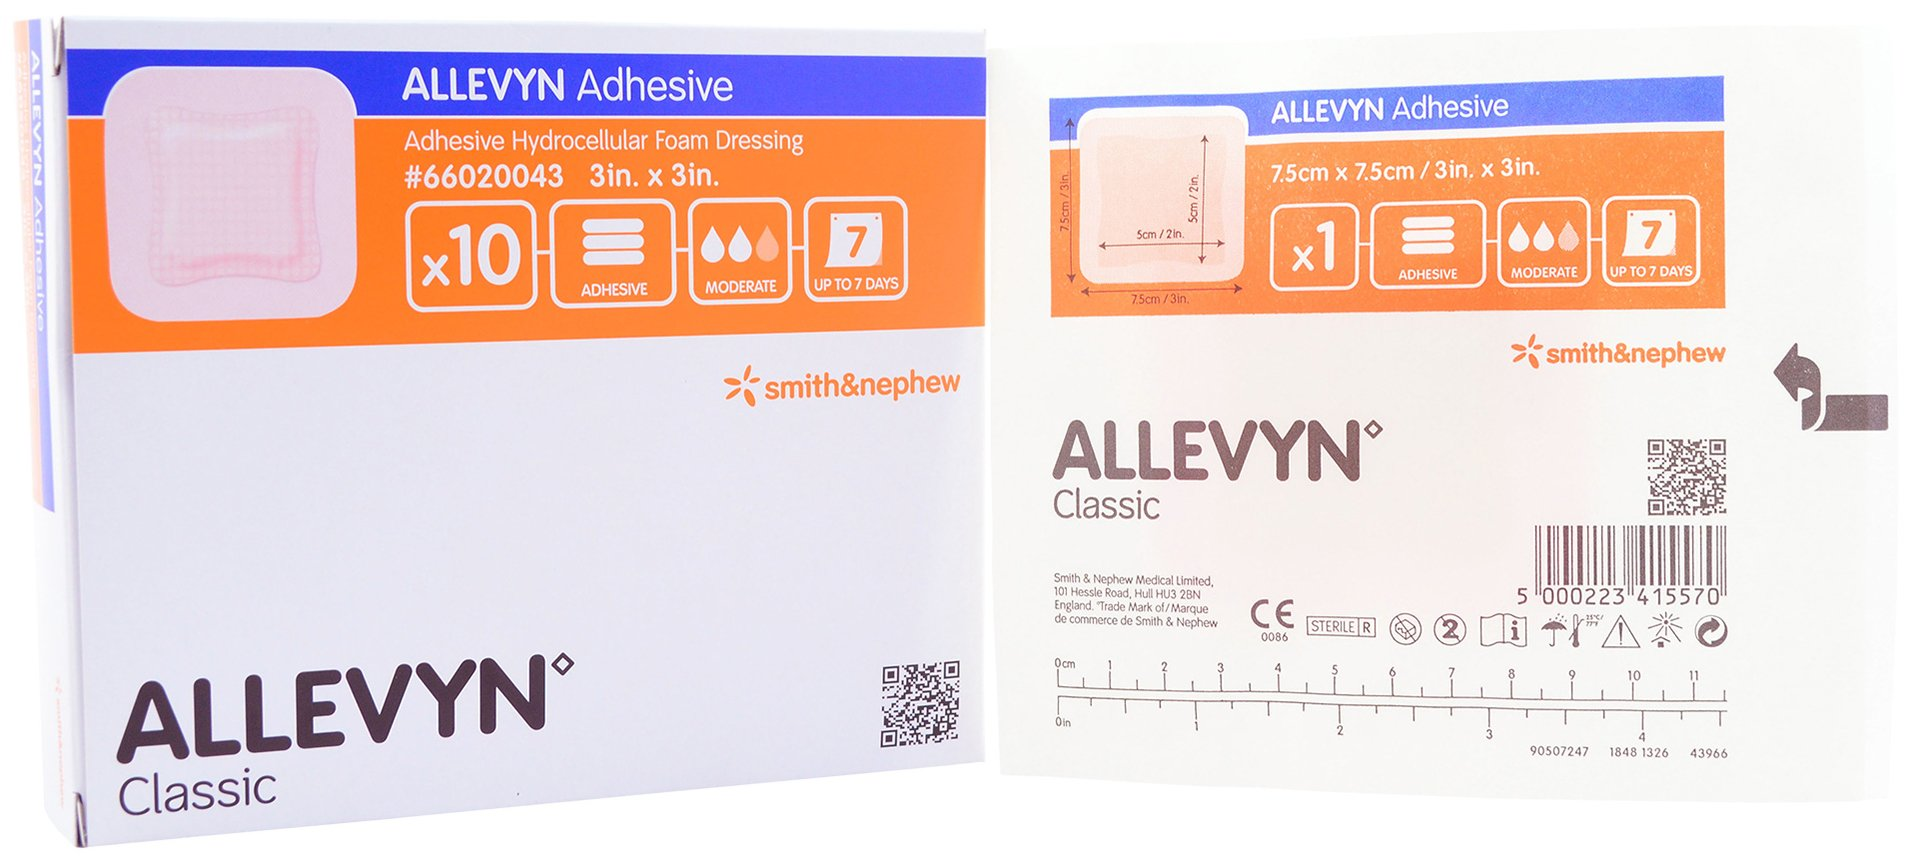 Dressing Adhesive Allevyn 3''x3'' - Smith & Nephew 66020043